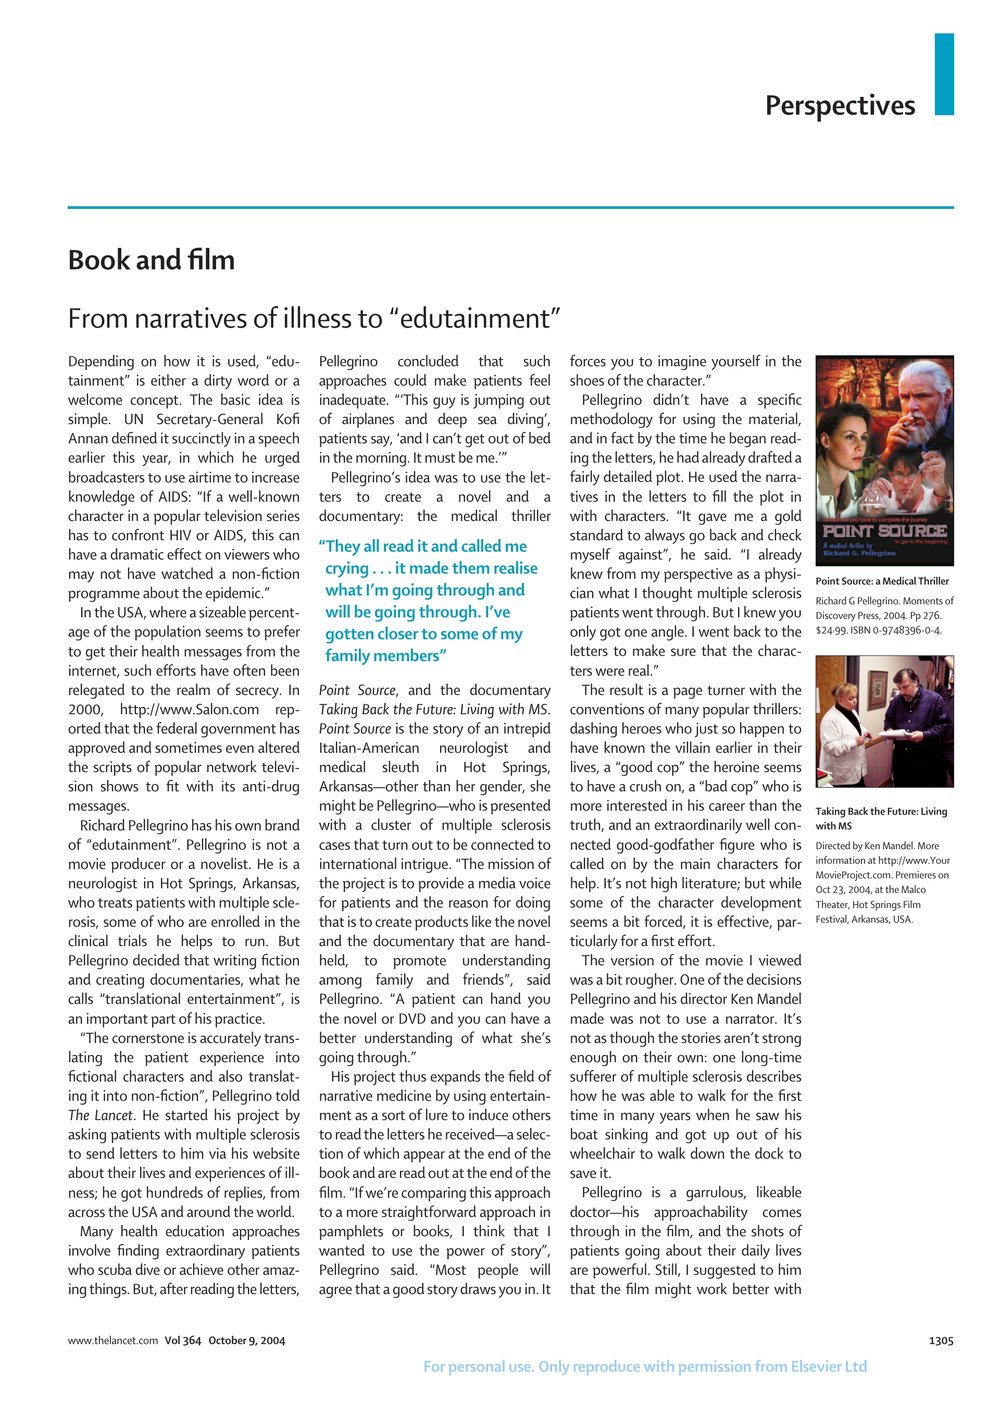 Lance Article - pg 1 of 2.jpg